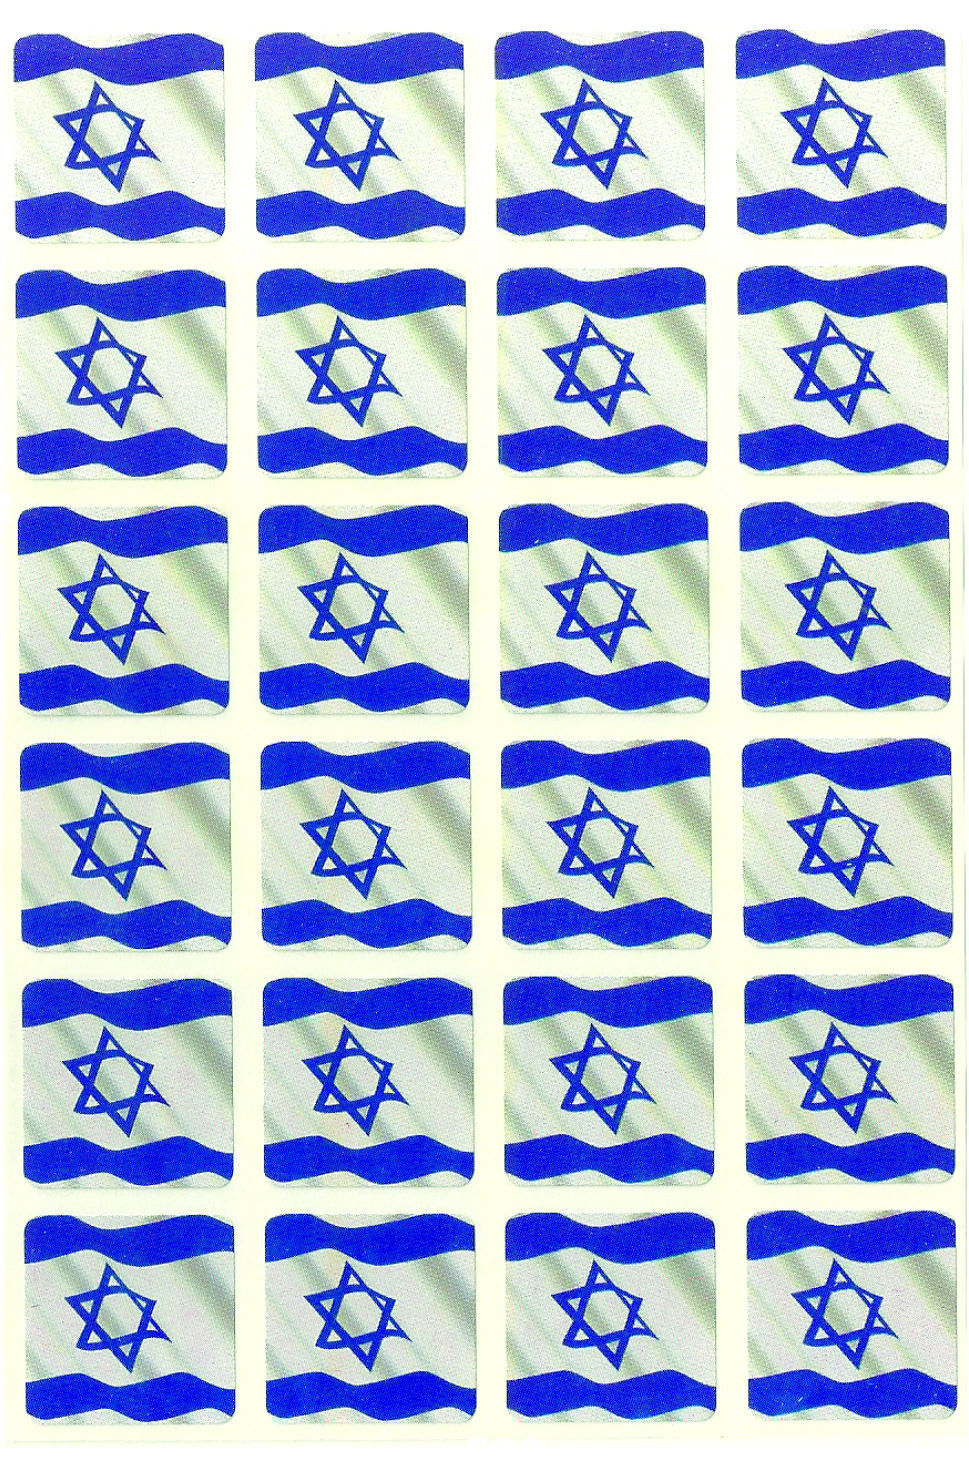 Judaica Atzmaut Independence Day Israeli Flag 240 Stickers Children Teaching Aid